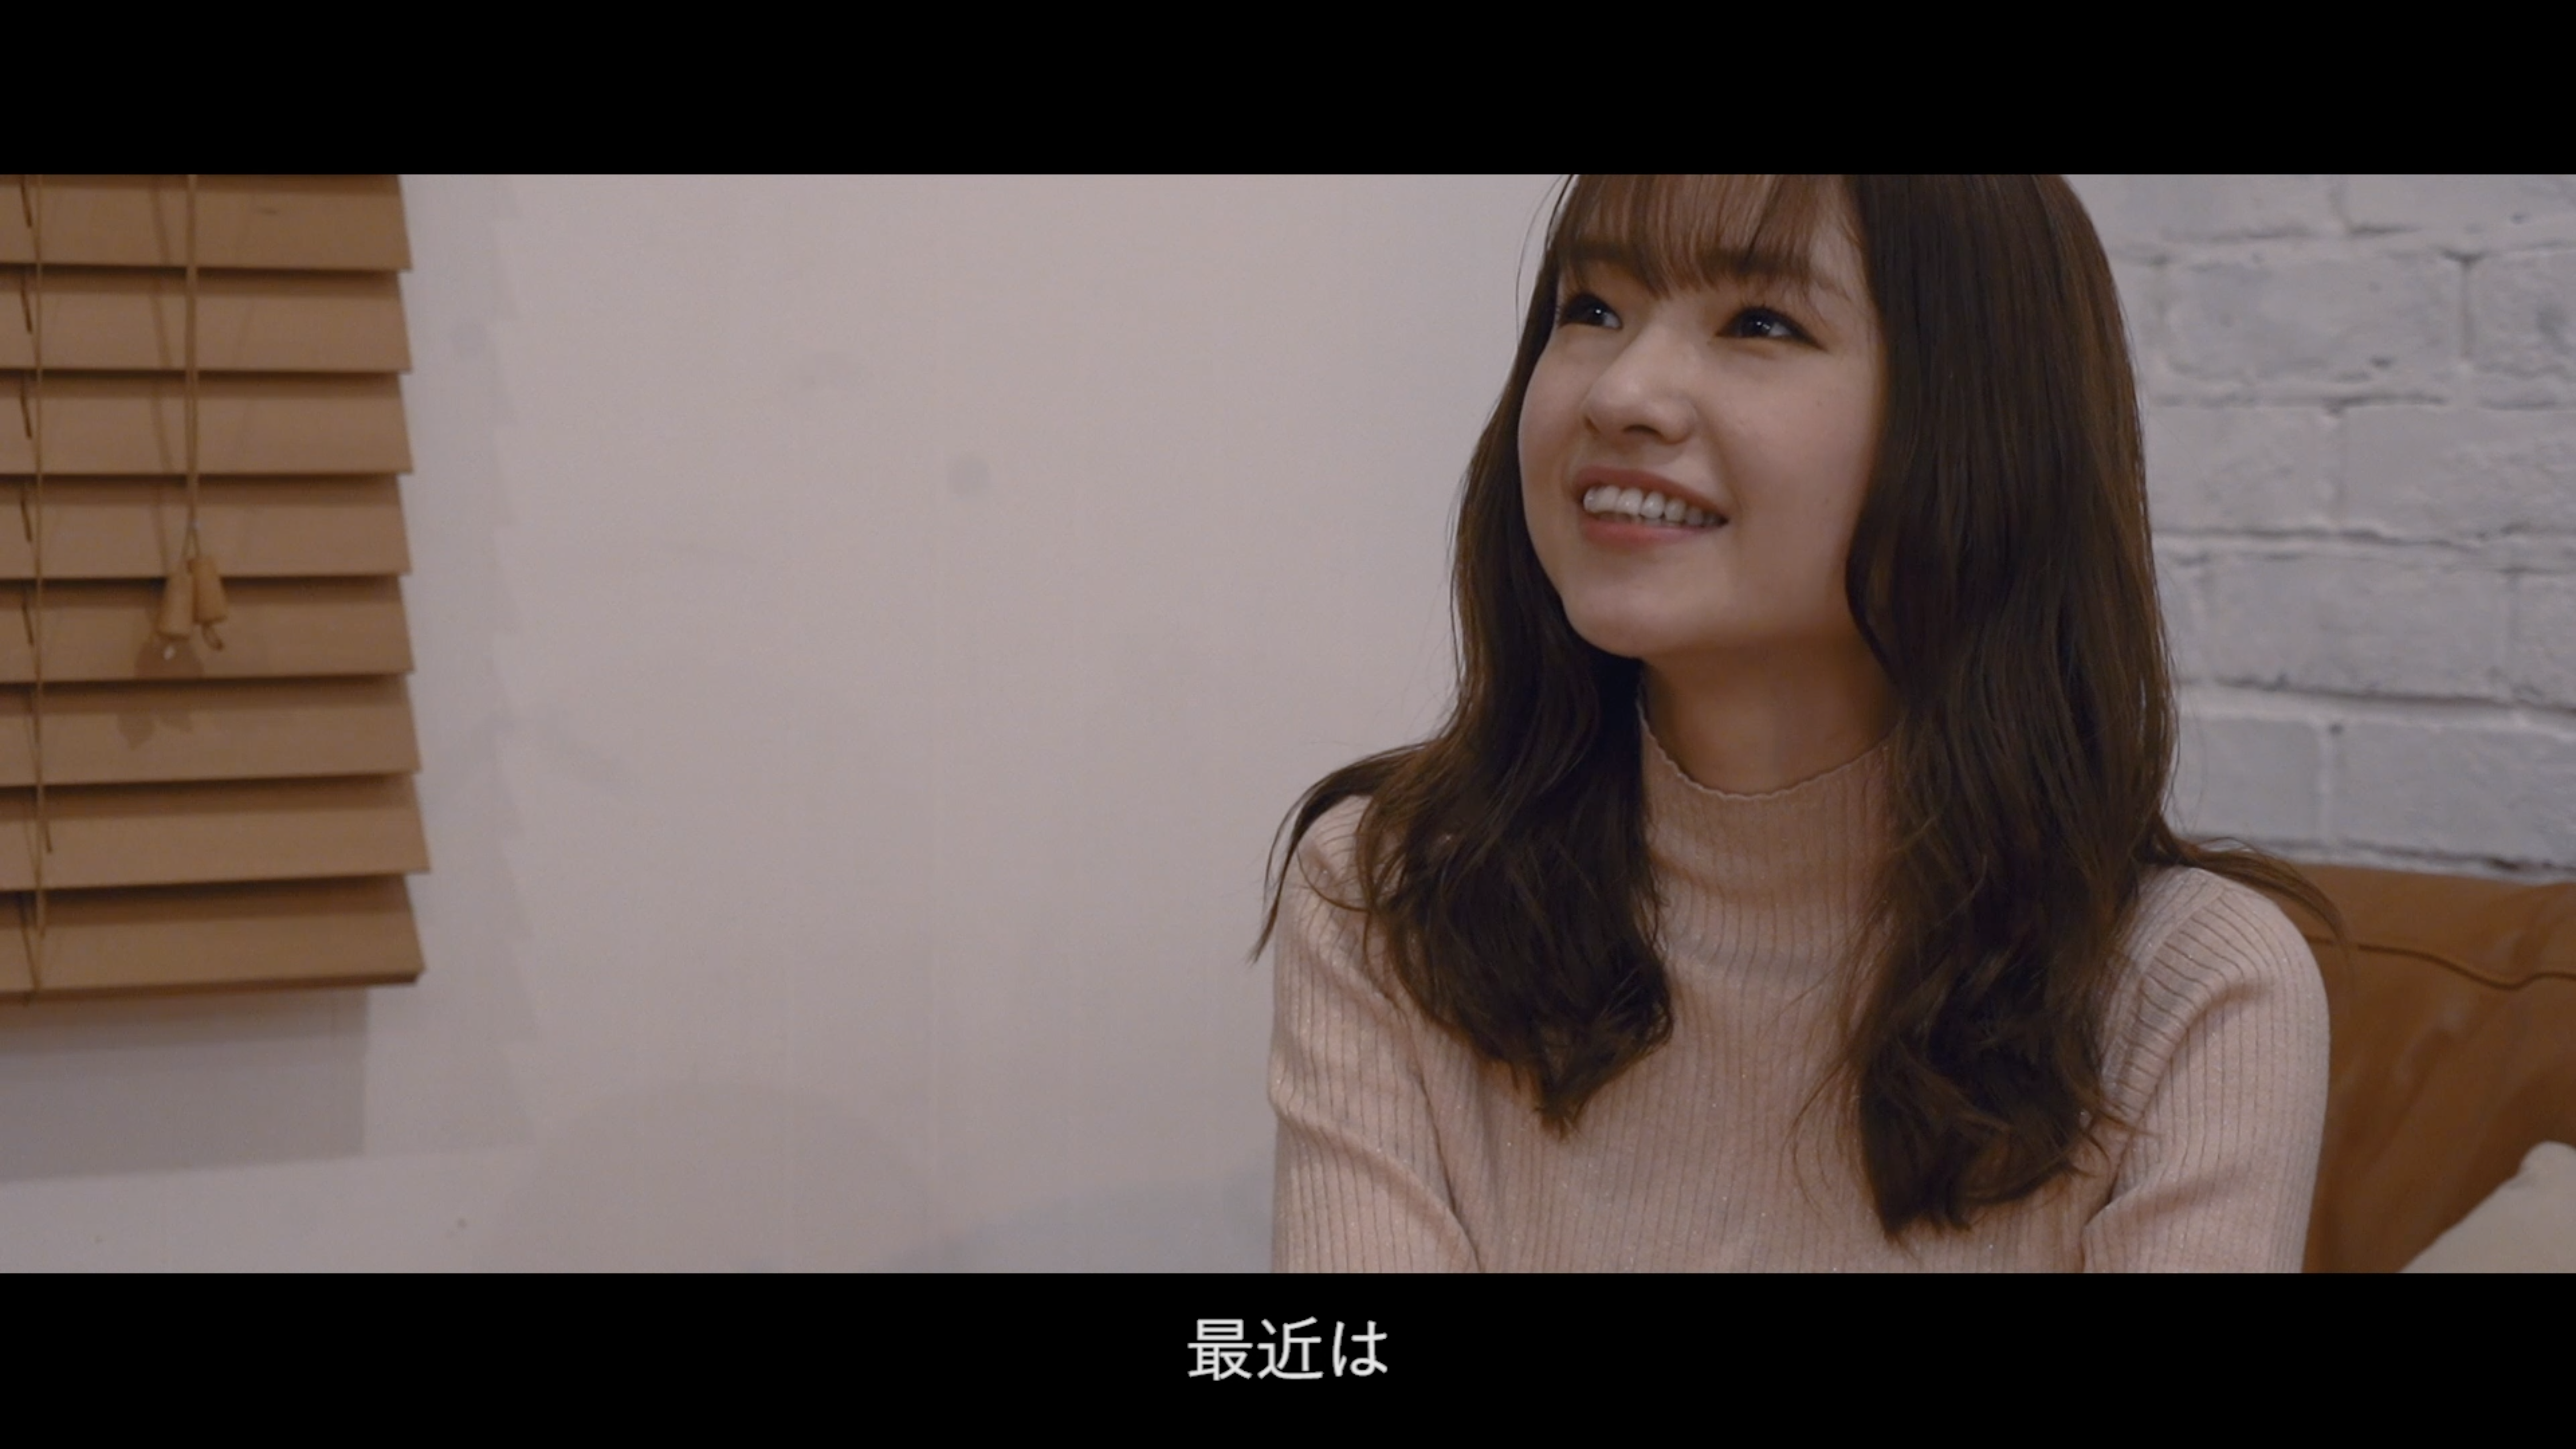 hy4_4yh(ハイパーヨーヨ)ドキュメンタリー第6話 画像15